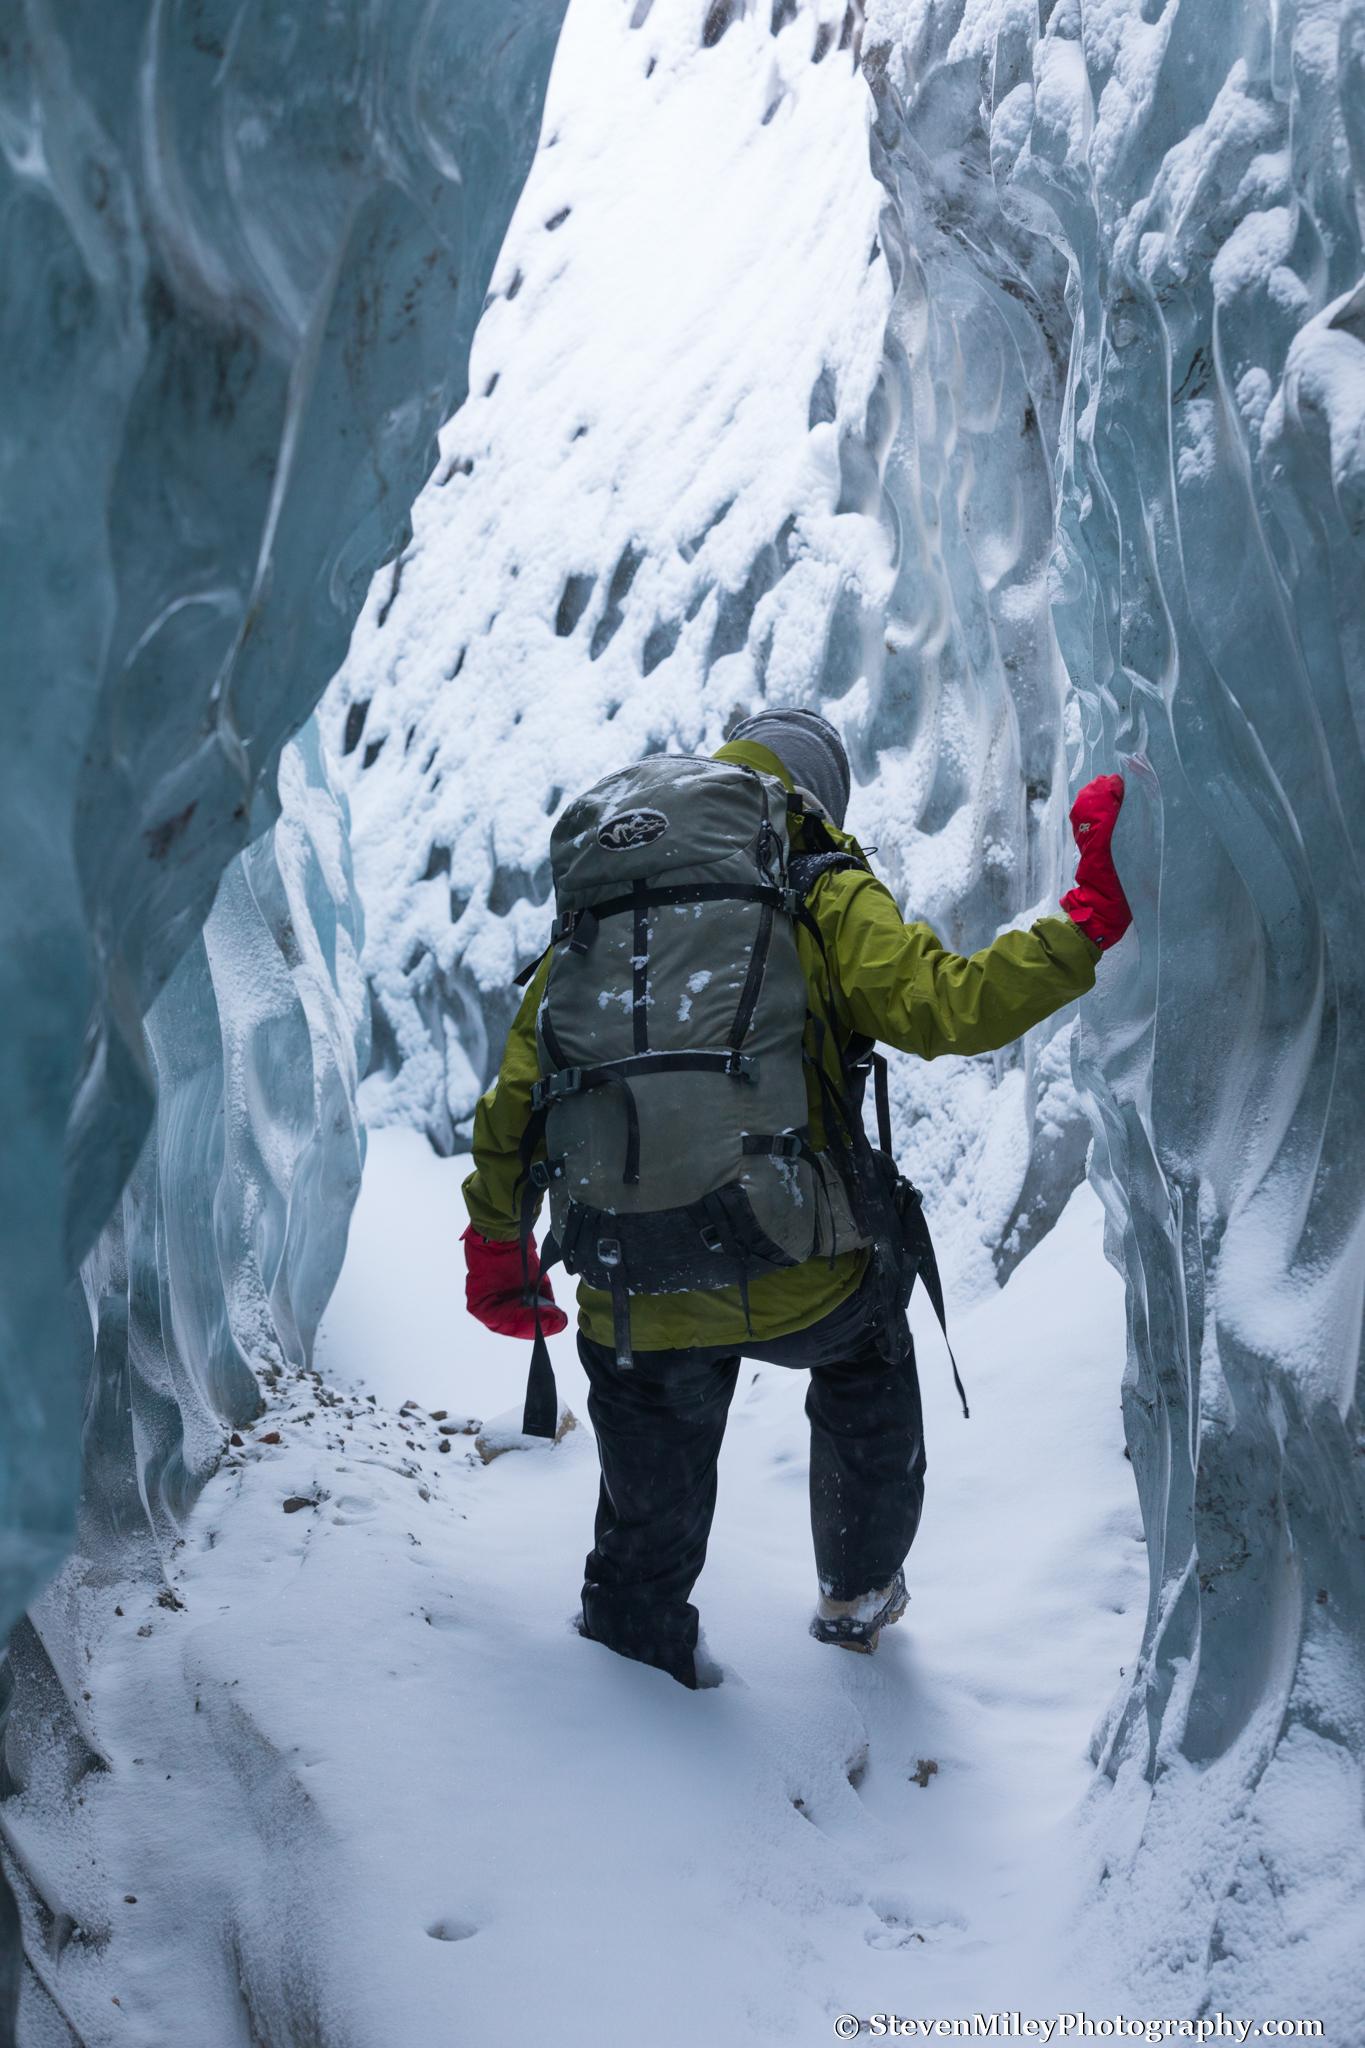 ba85fd1056b Black Rapids Glacier January 2018 — Steven Miley Photography